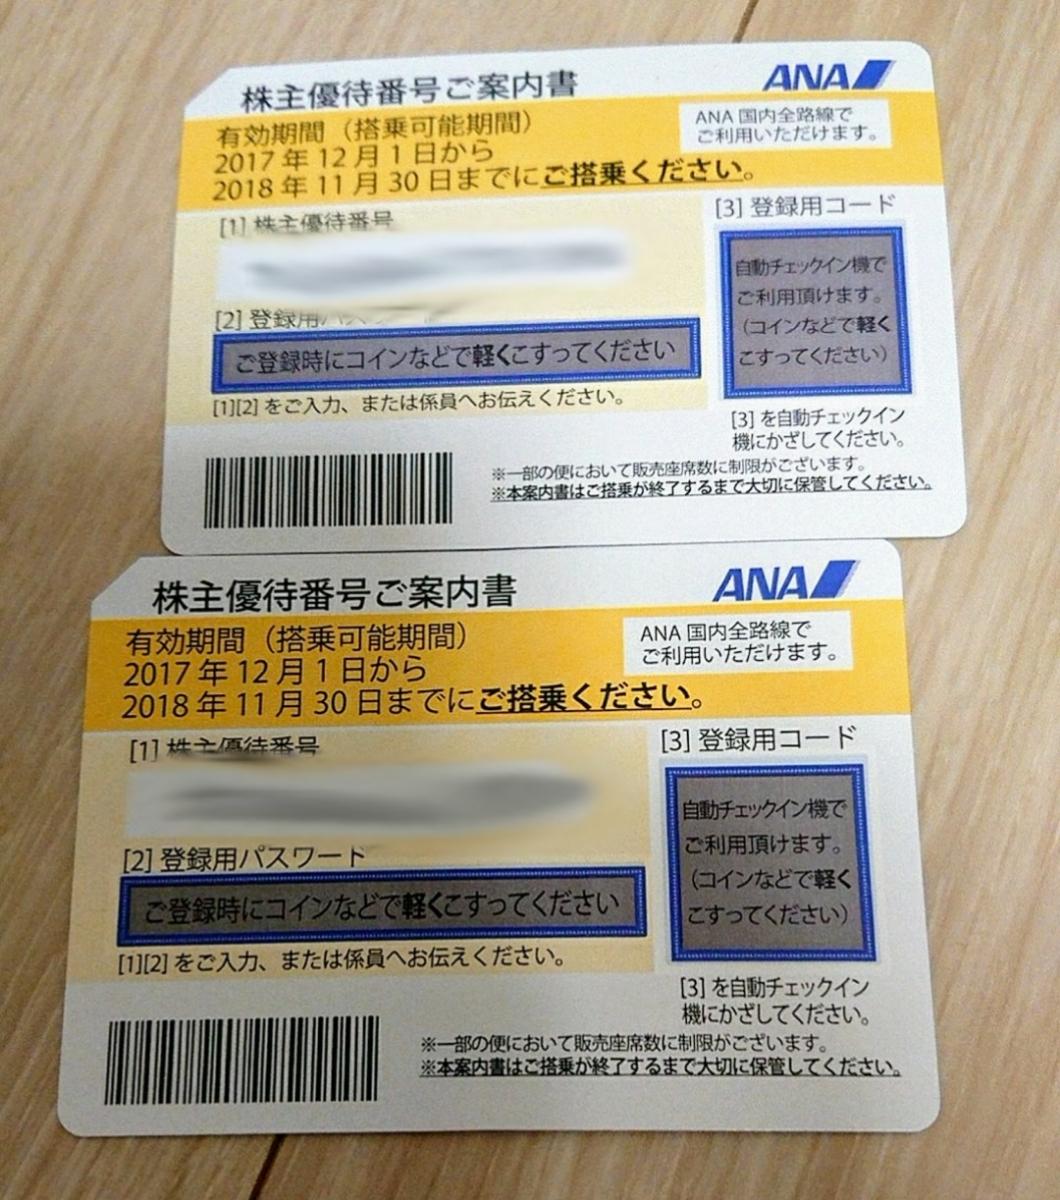 ANA◆全日空◆株主優待券◆2枚セット◆2018年11/30まで◆②